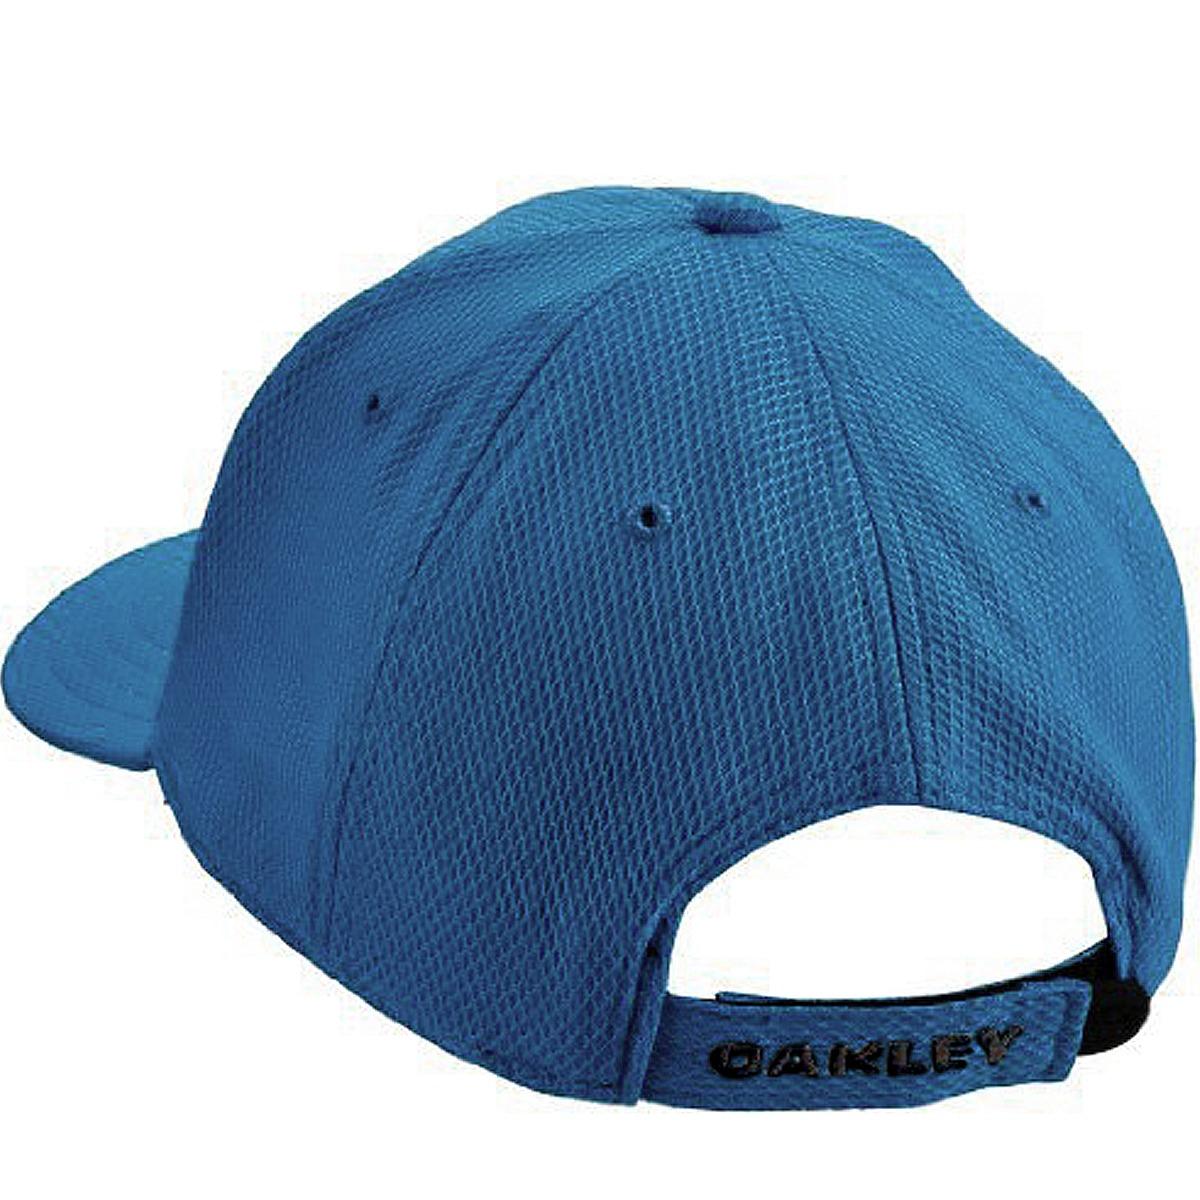 boné oakley golf ellipse hidrolix azul califórnia. Carregando zoom. 88a665491e5